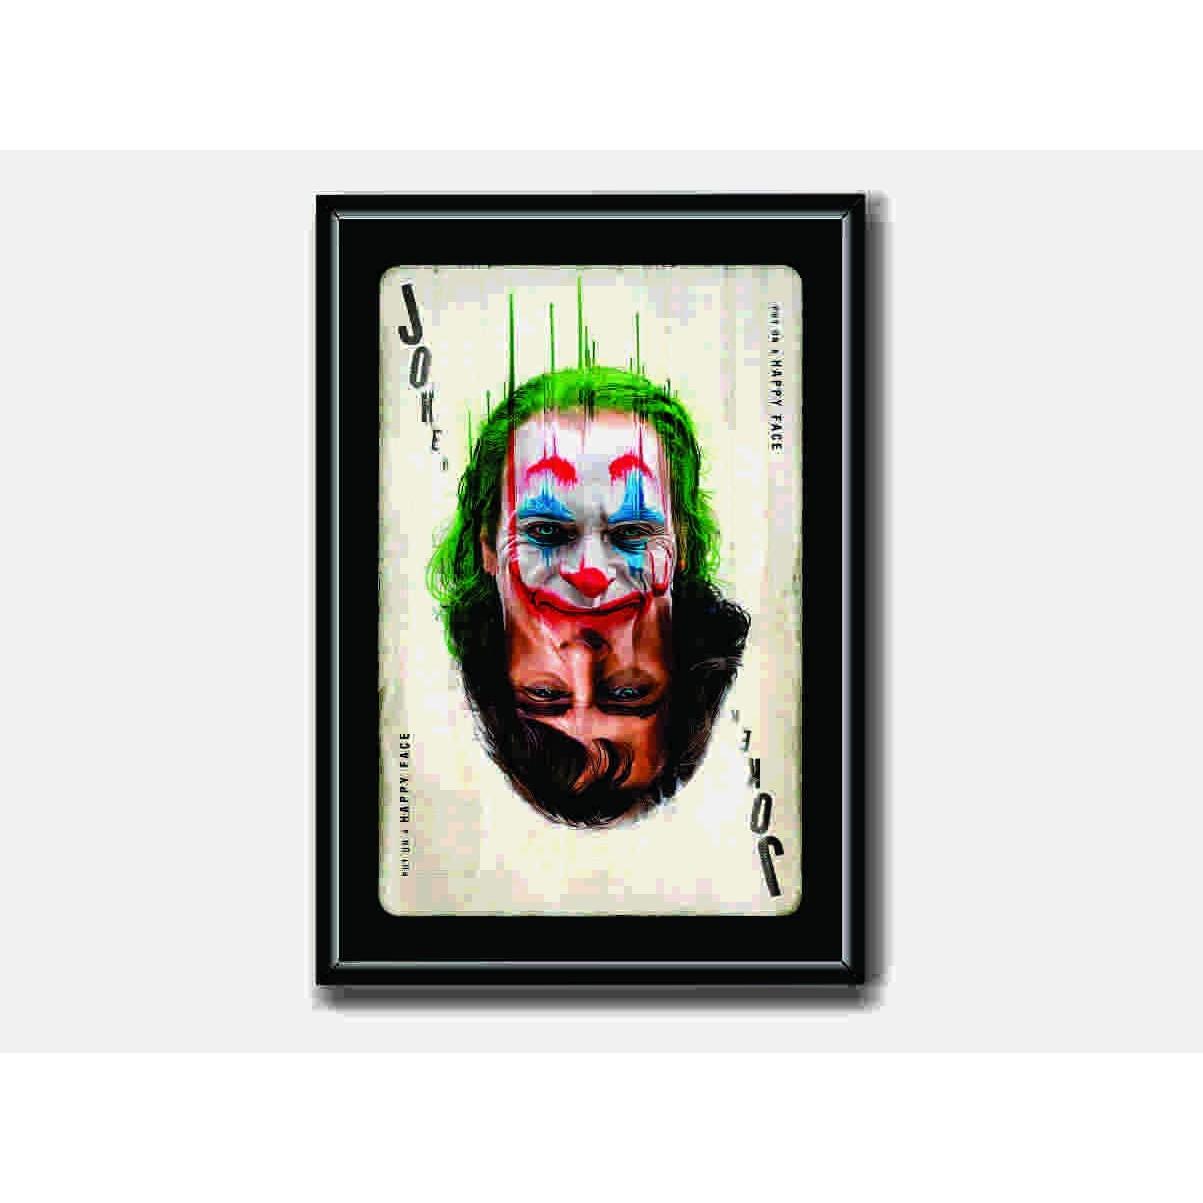 Quadro decorativo com Moldura e Vidro - Joker/Coringa 50x40cm